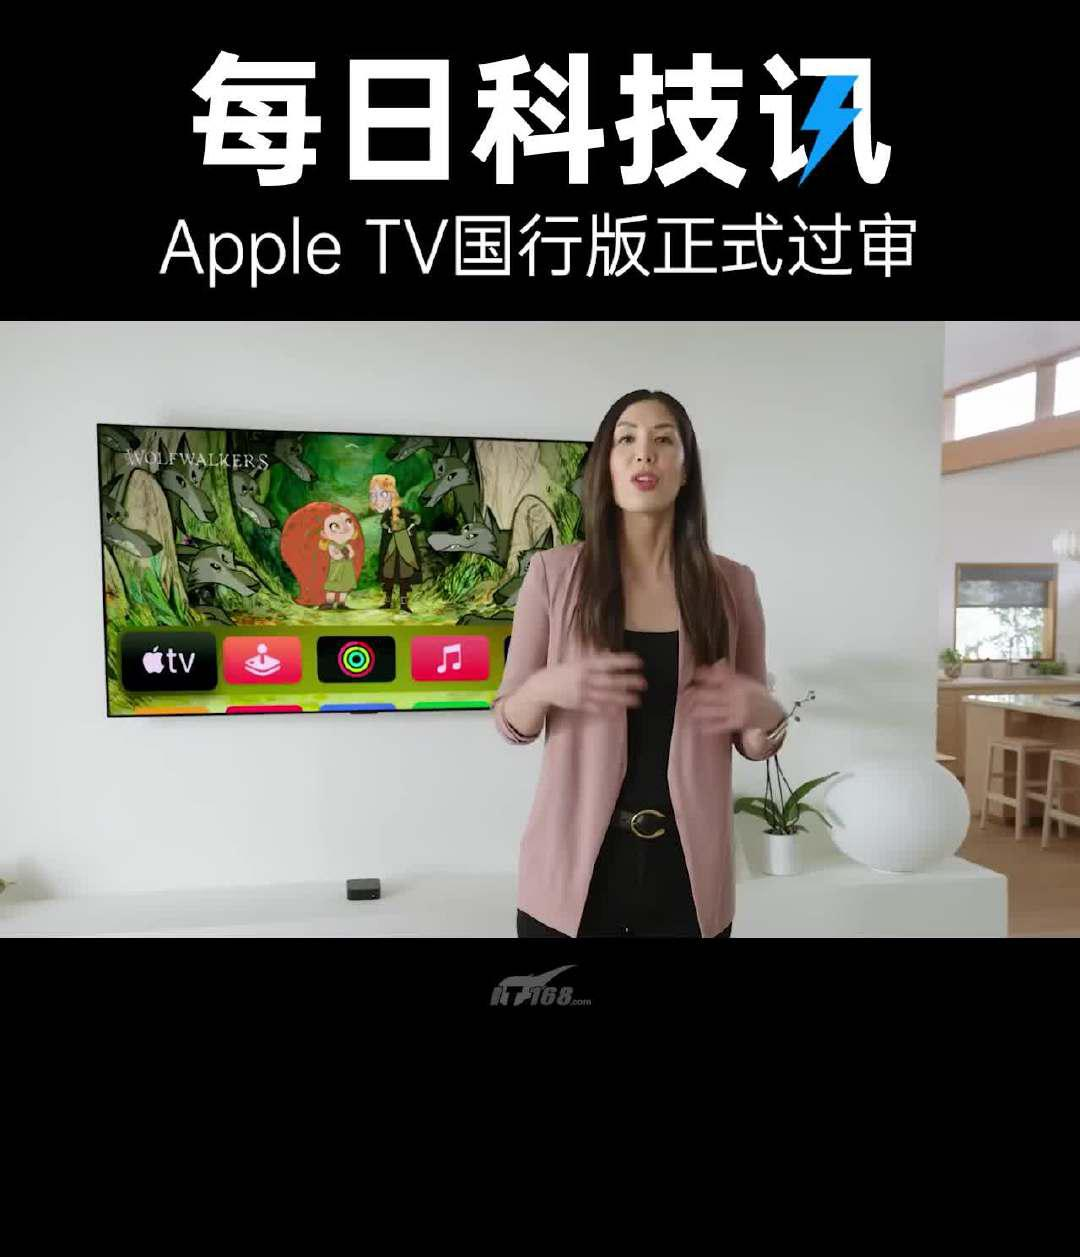 AppleTV将于9月或11月入华?别闹了!